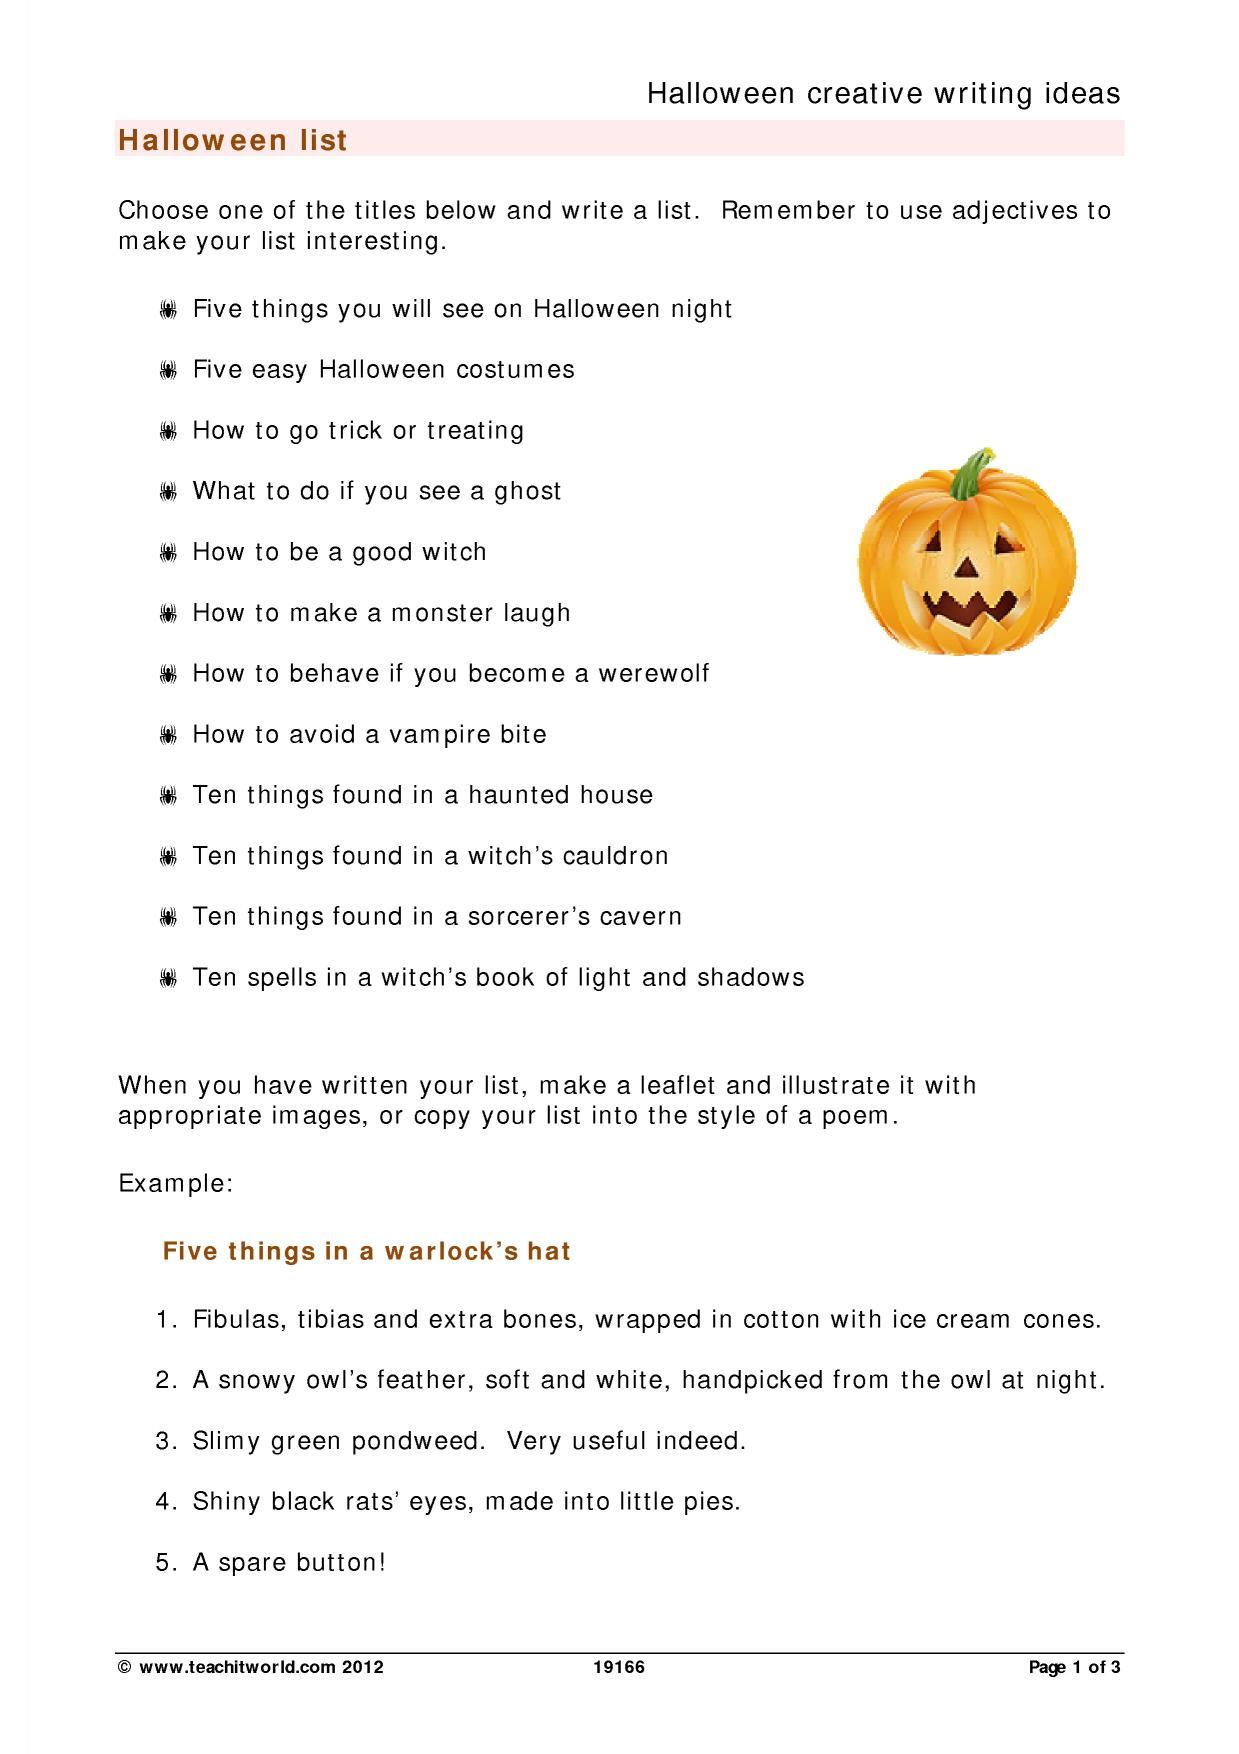 Halloween creative writing college essay editing service